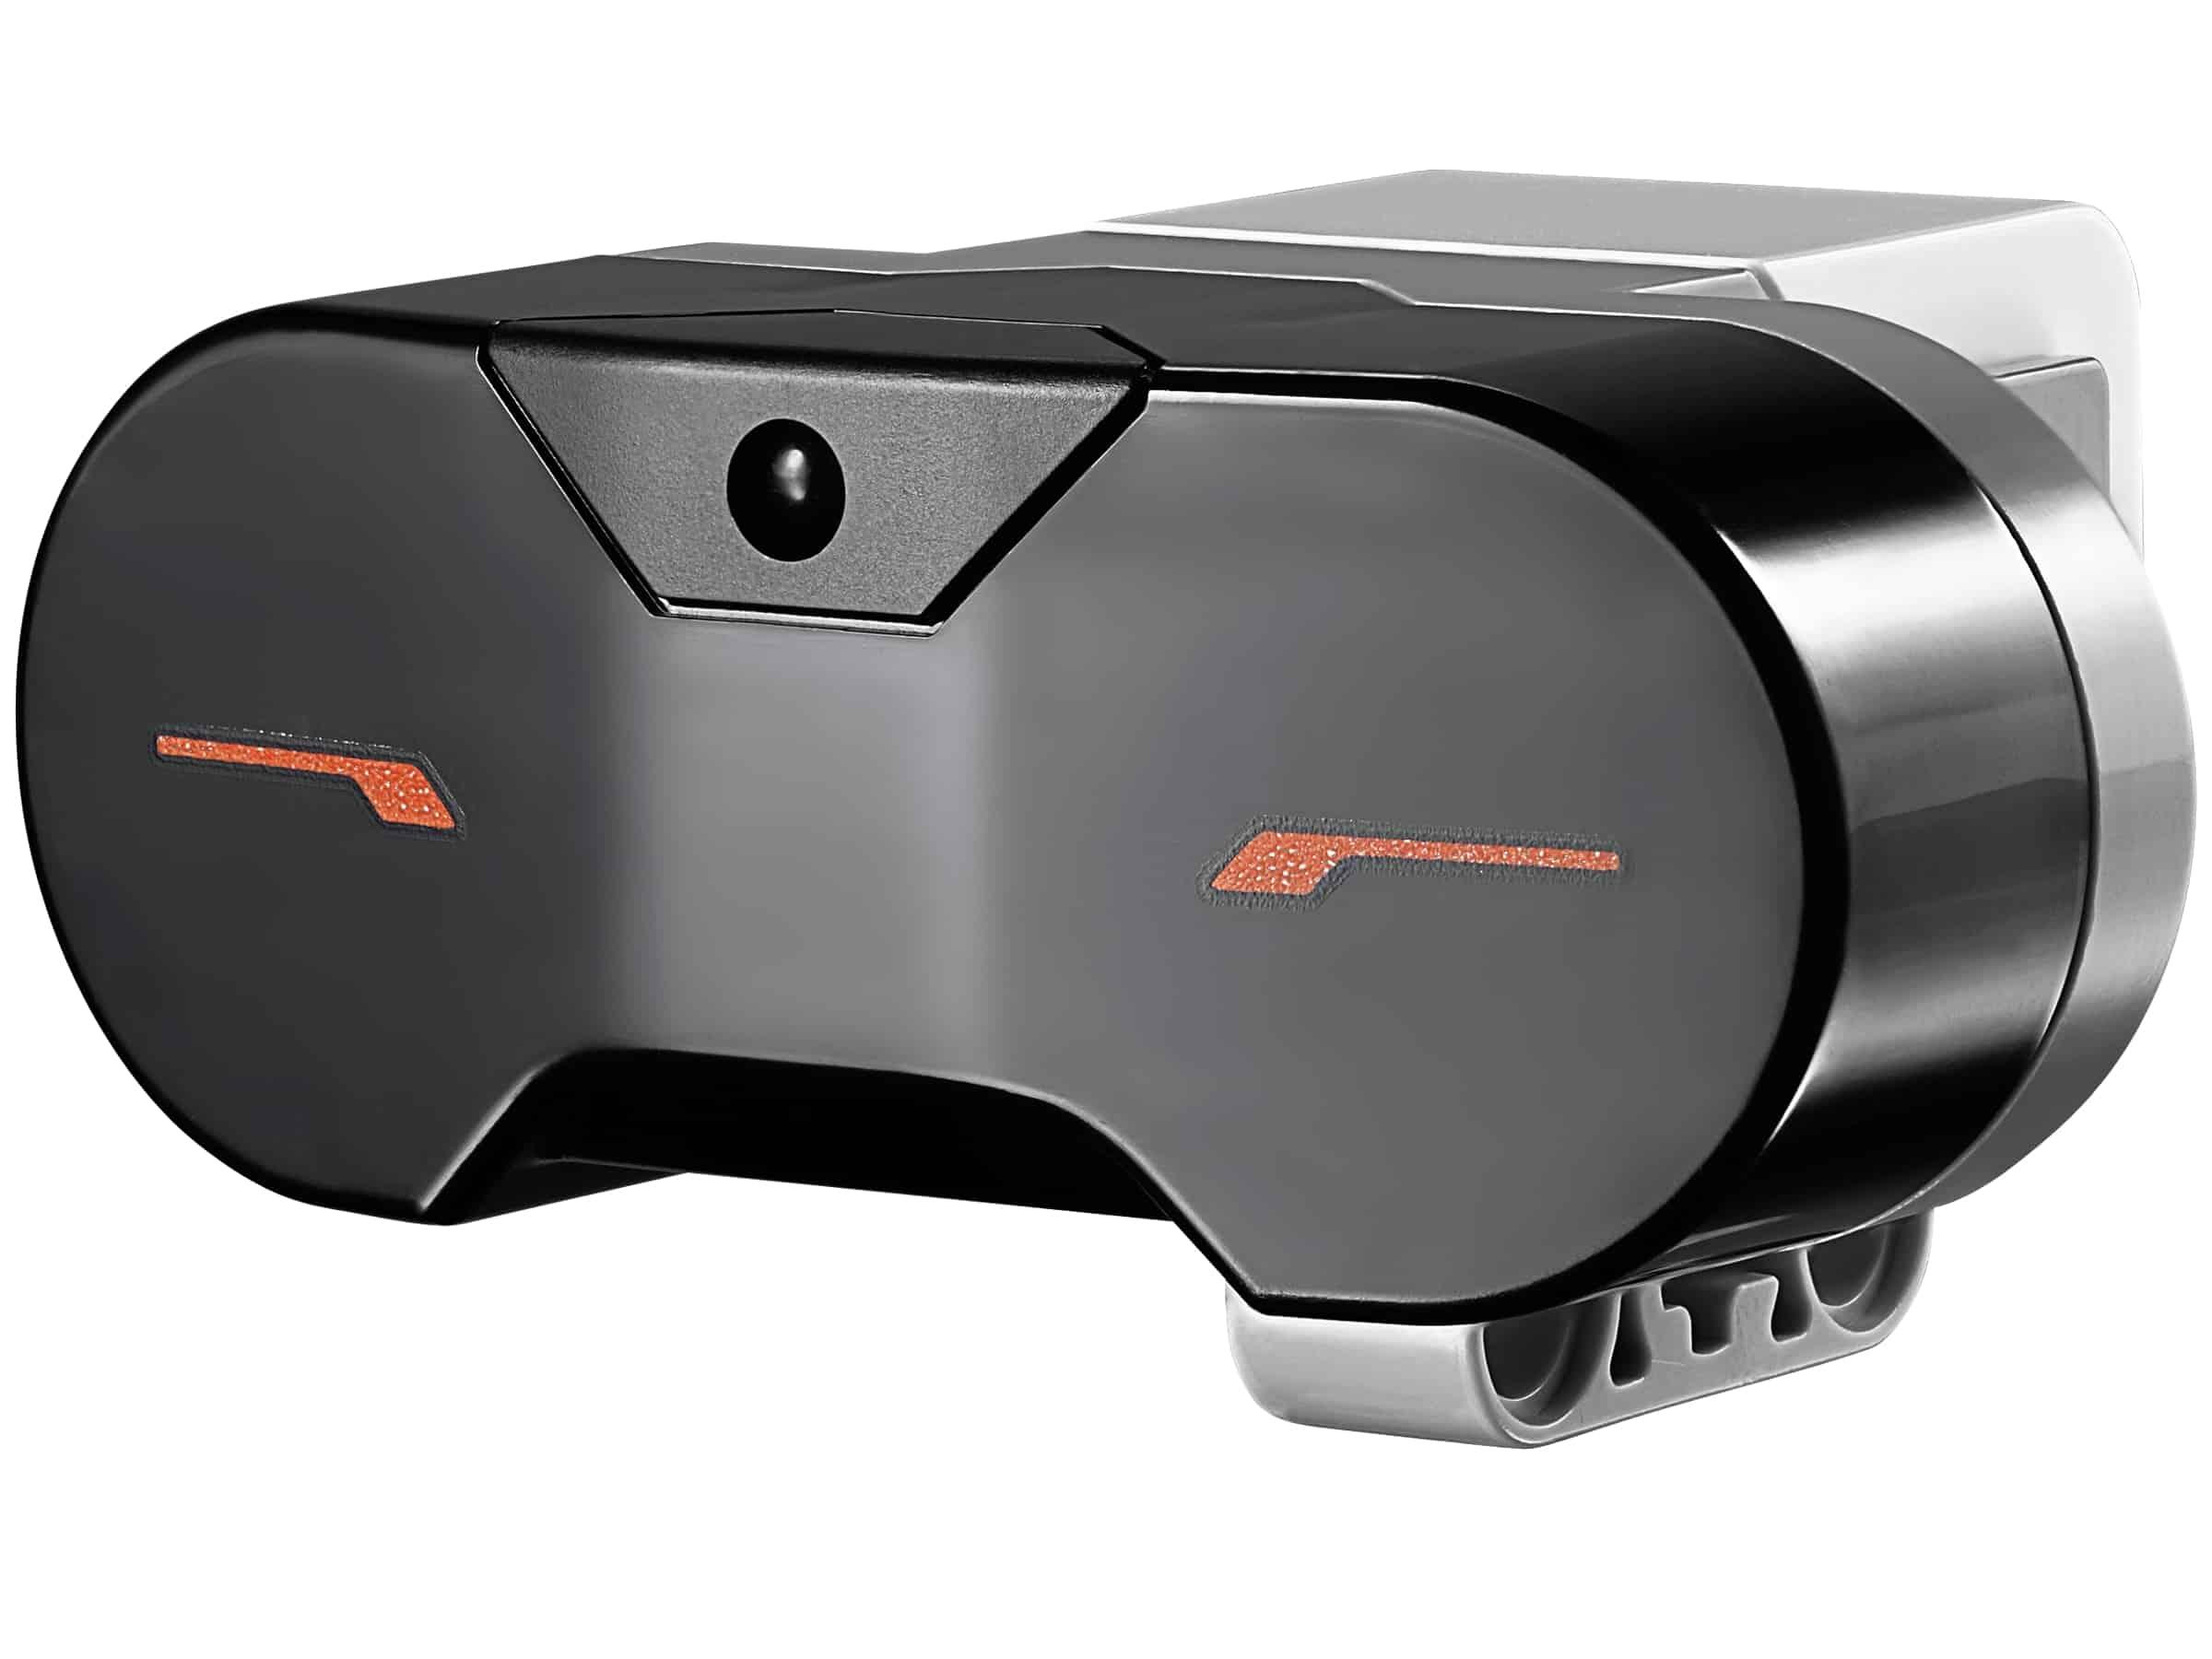 lego infrarode ev3 zoeksensor 45509